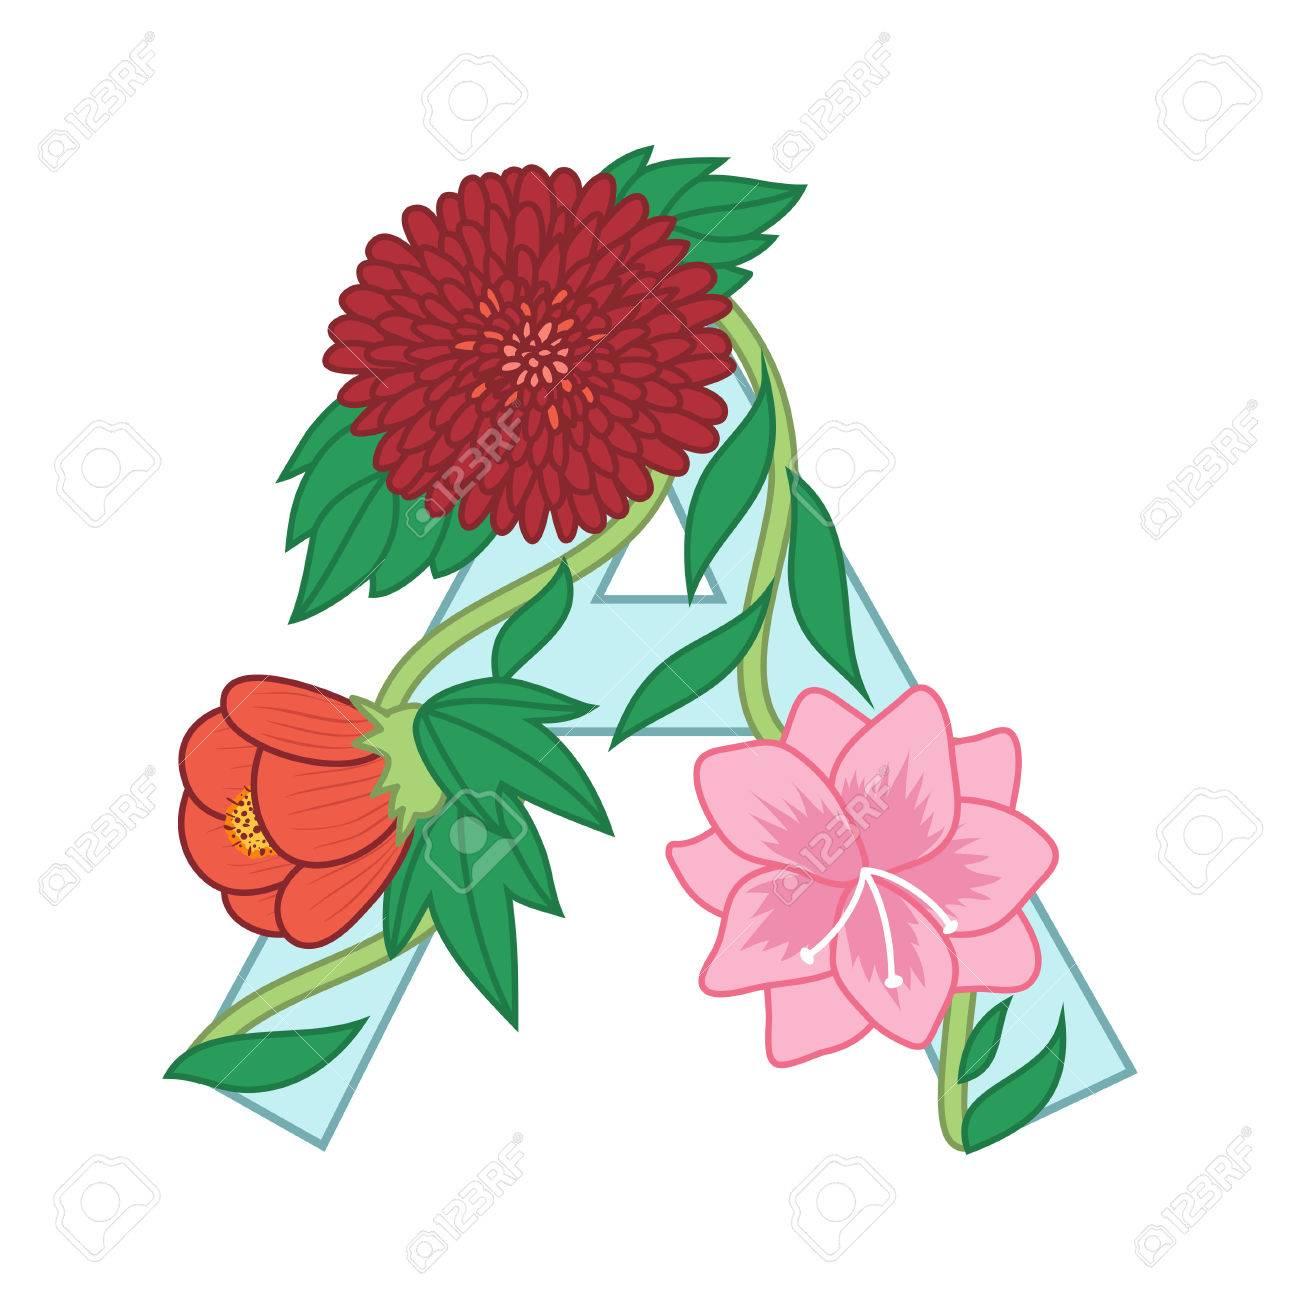 cute flower letter a floral monogram a with vintage flowers rh 123rf com vintage flower vector cdr vintage flower vector free